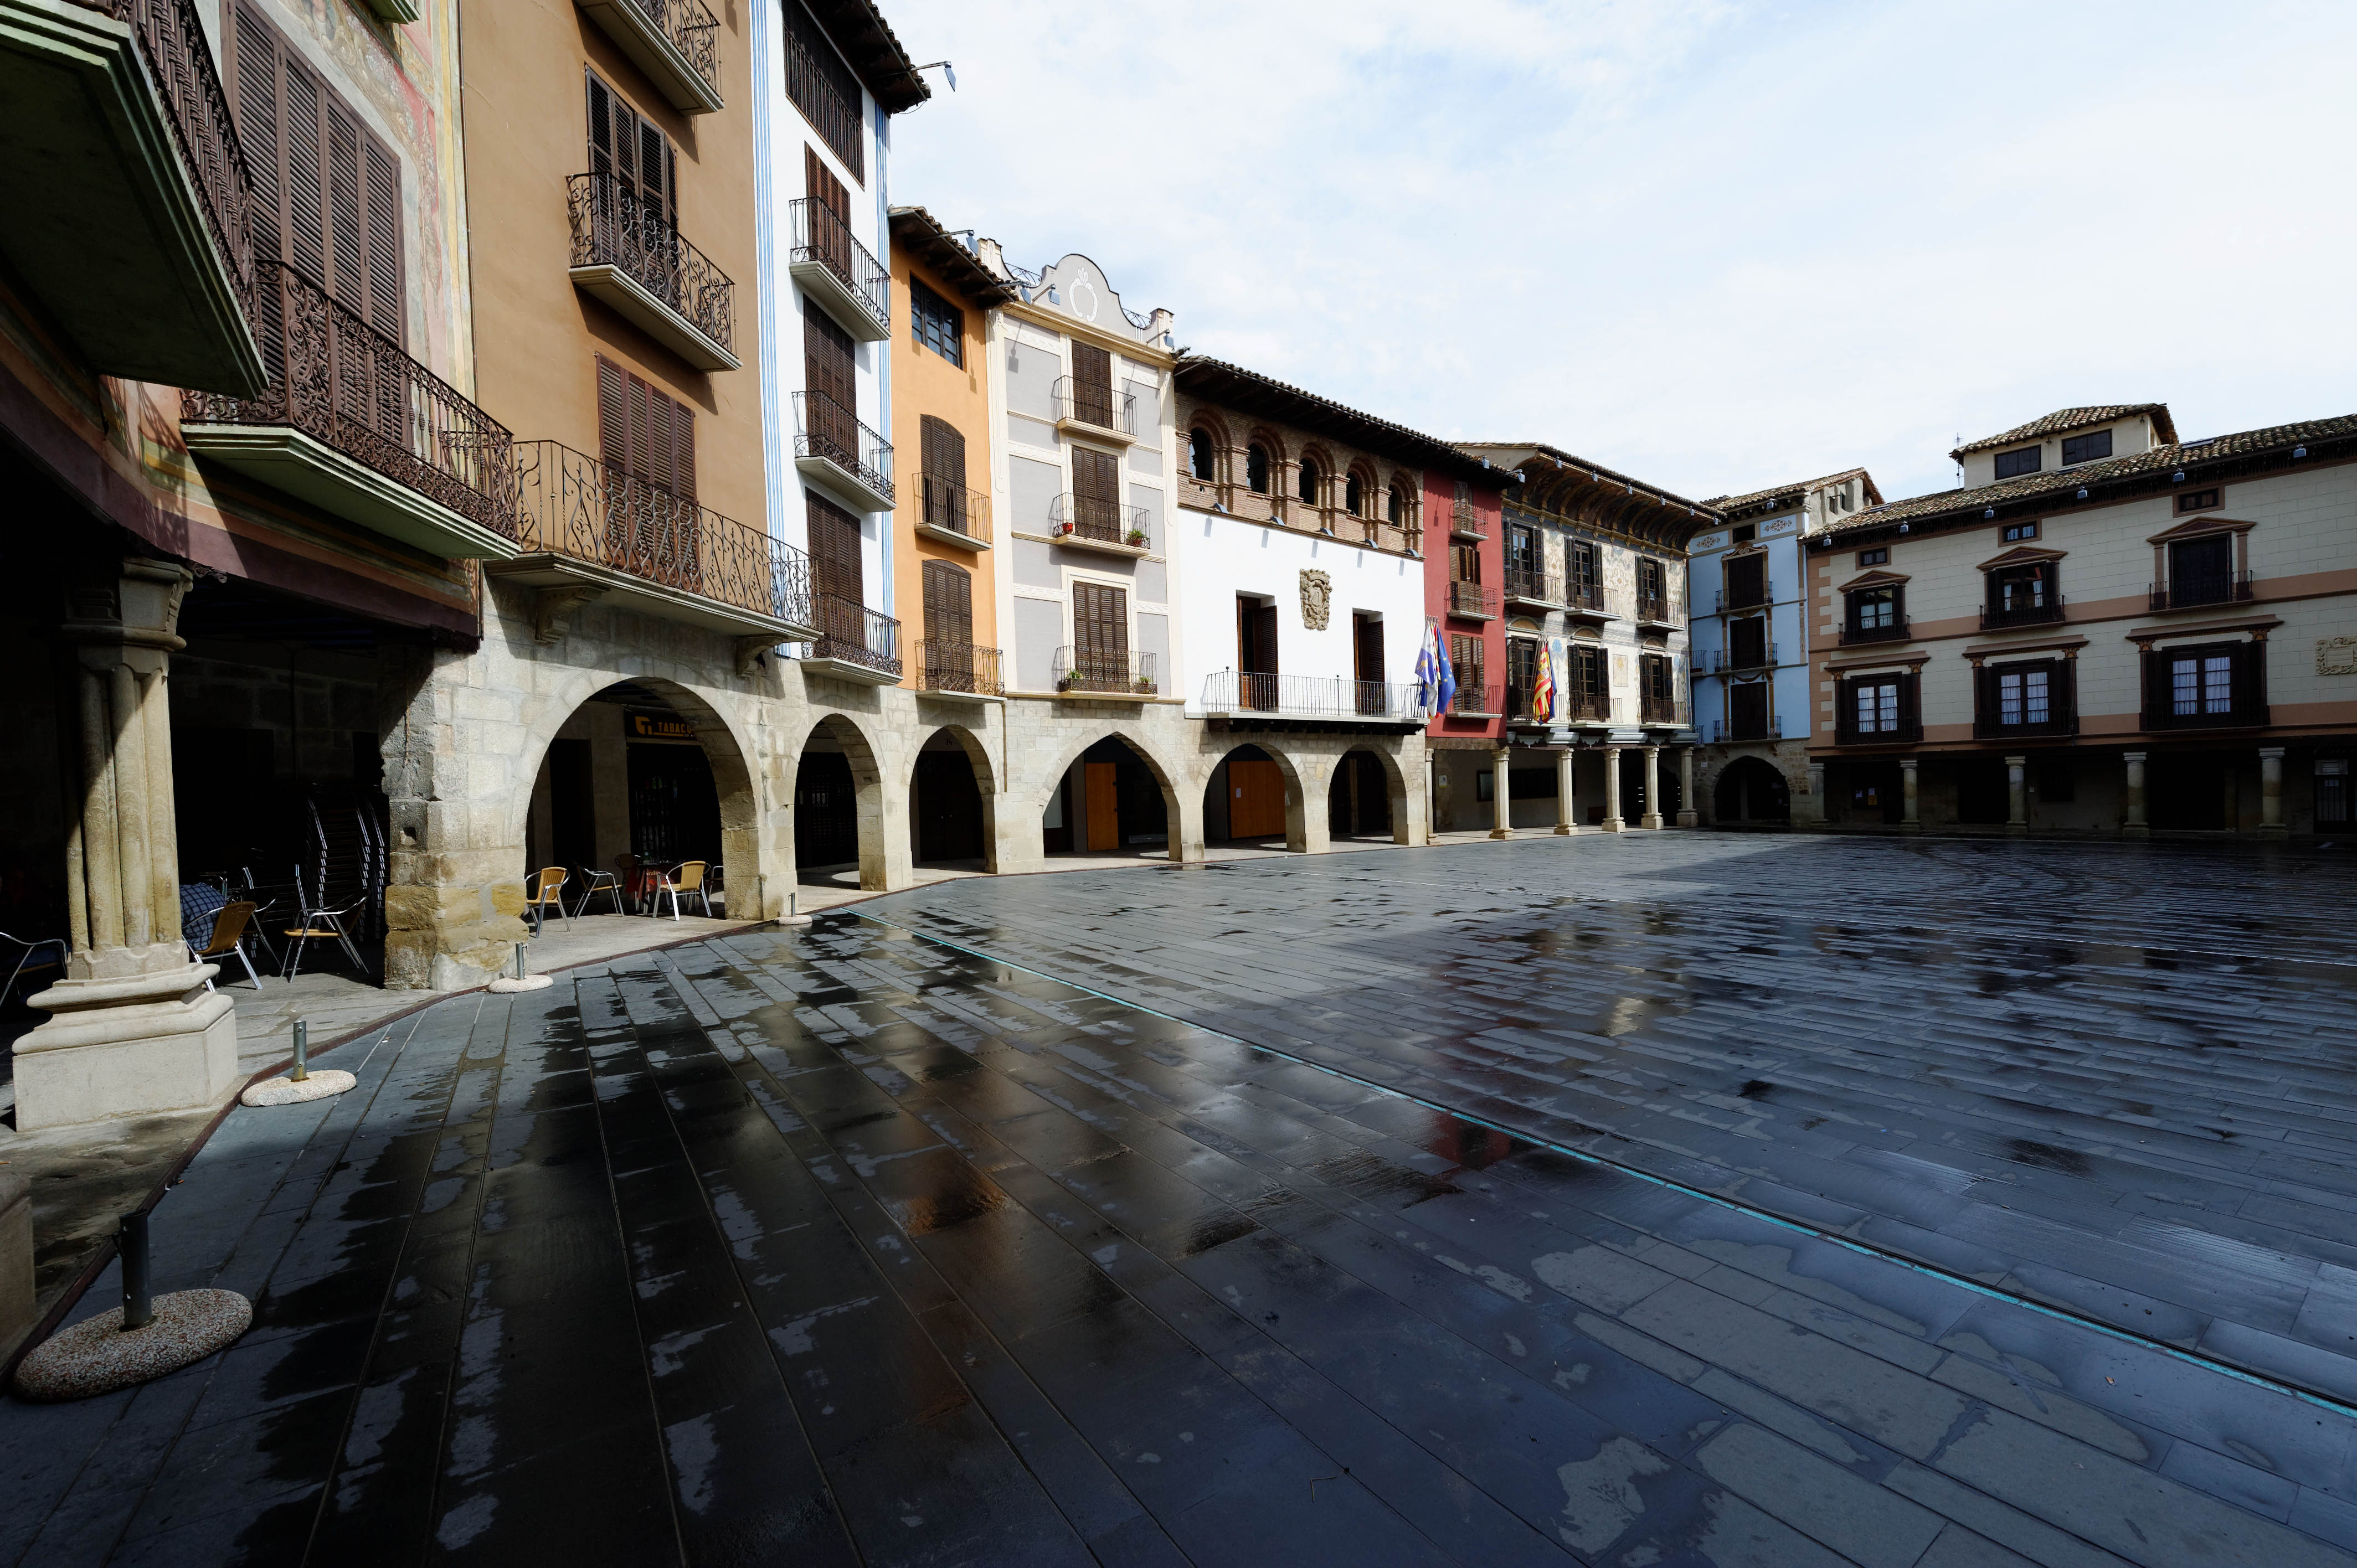 4335_Graus (Aragon)